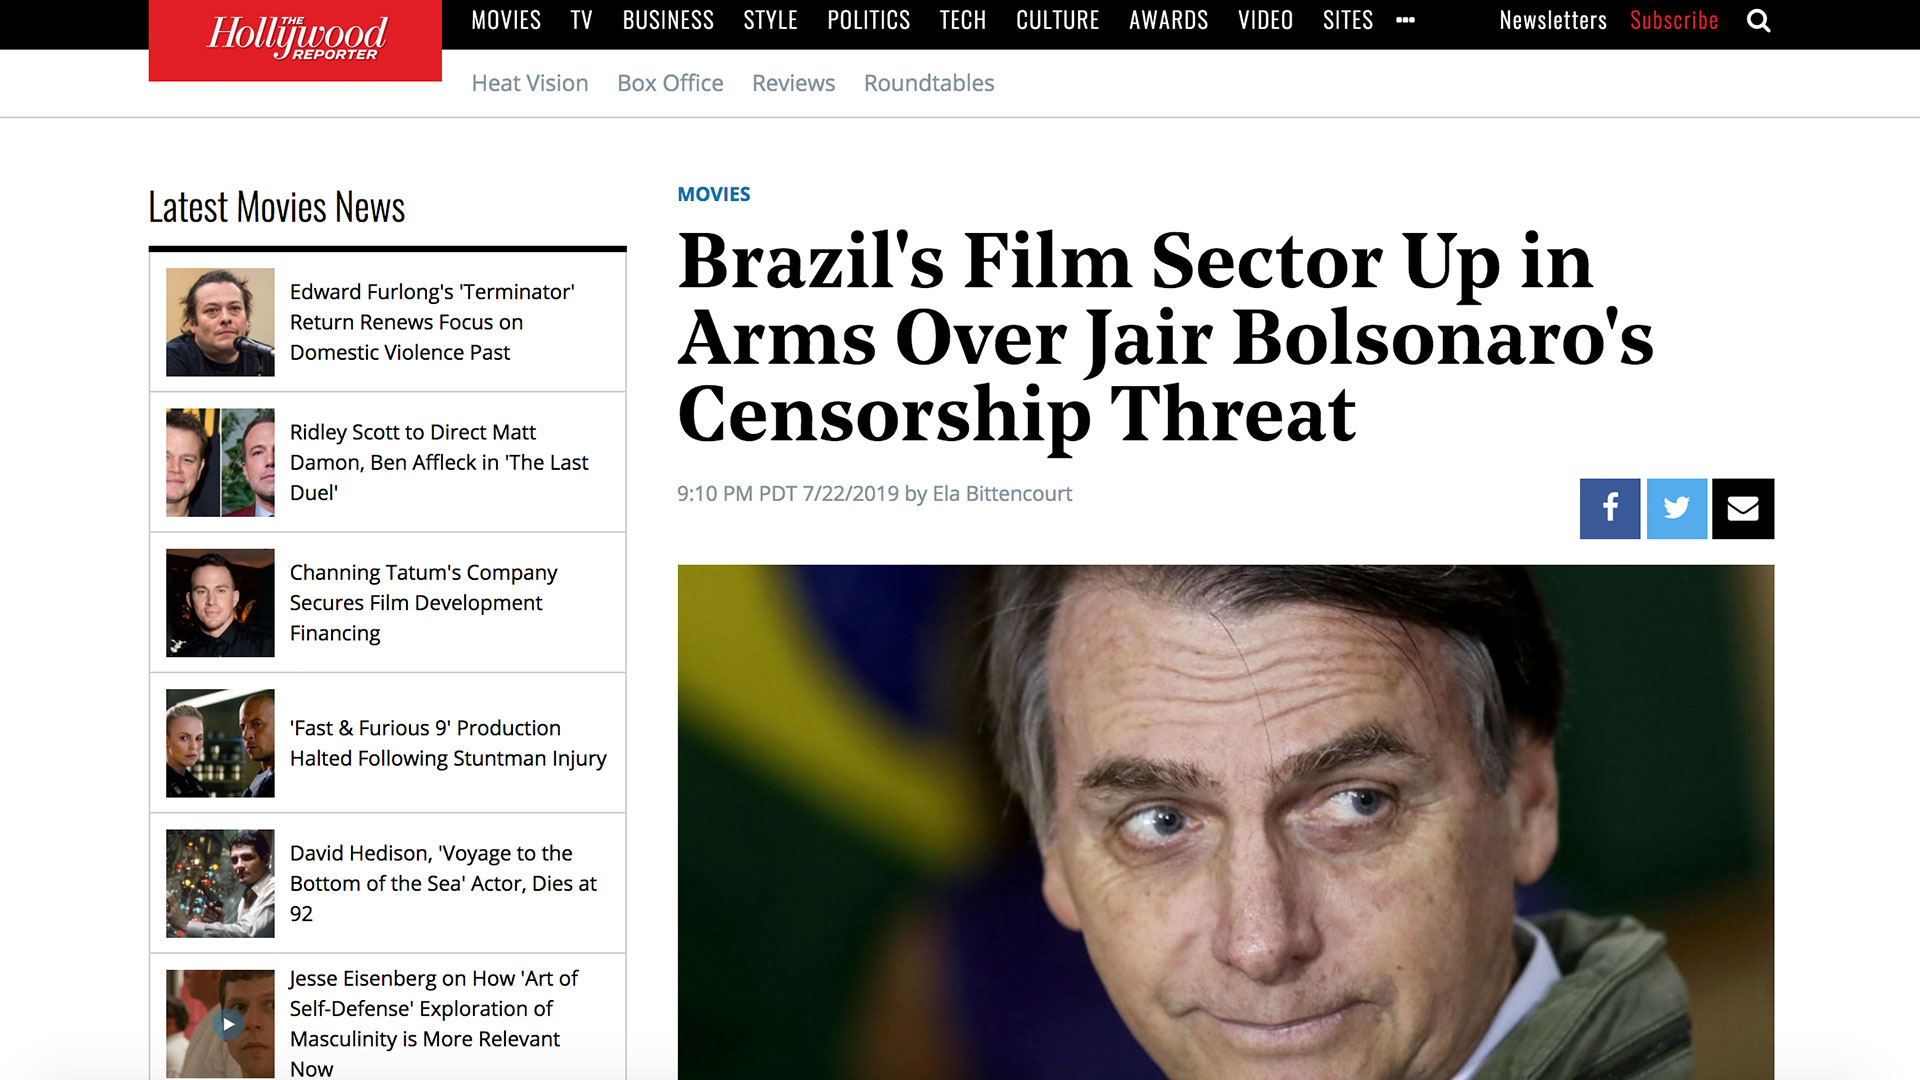 Fairness Rocks News Brazil's Film Sector Up in Arms Over Jair Bolsonaro's Censorship Threat